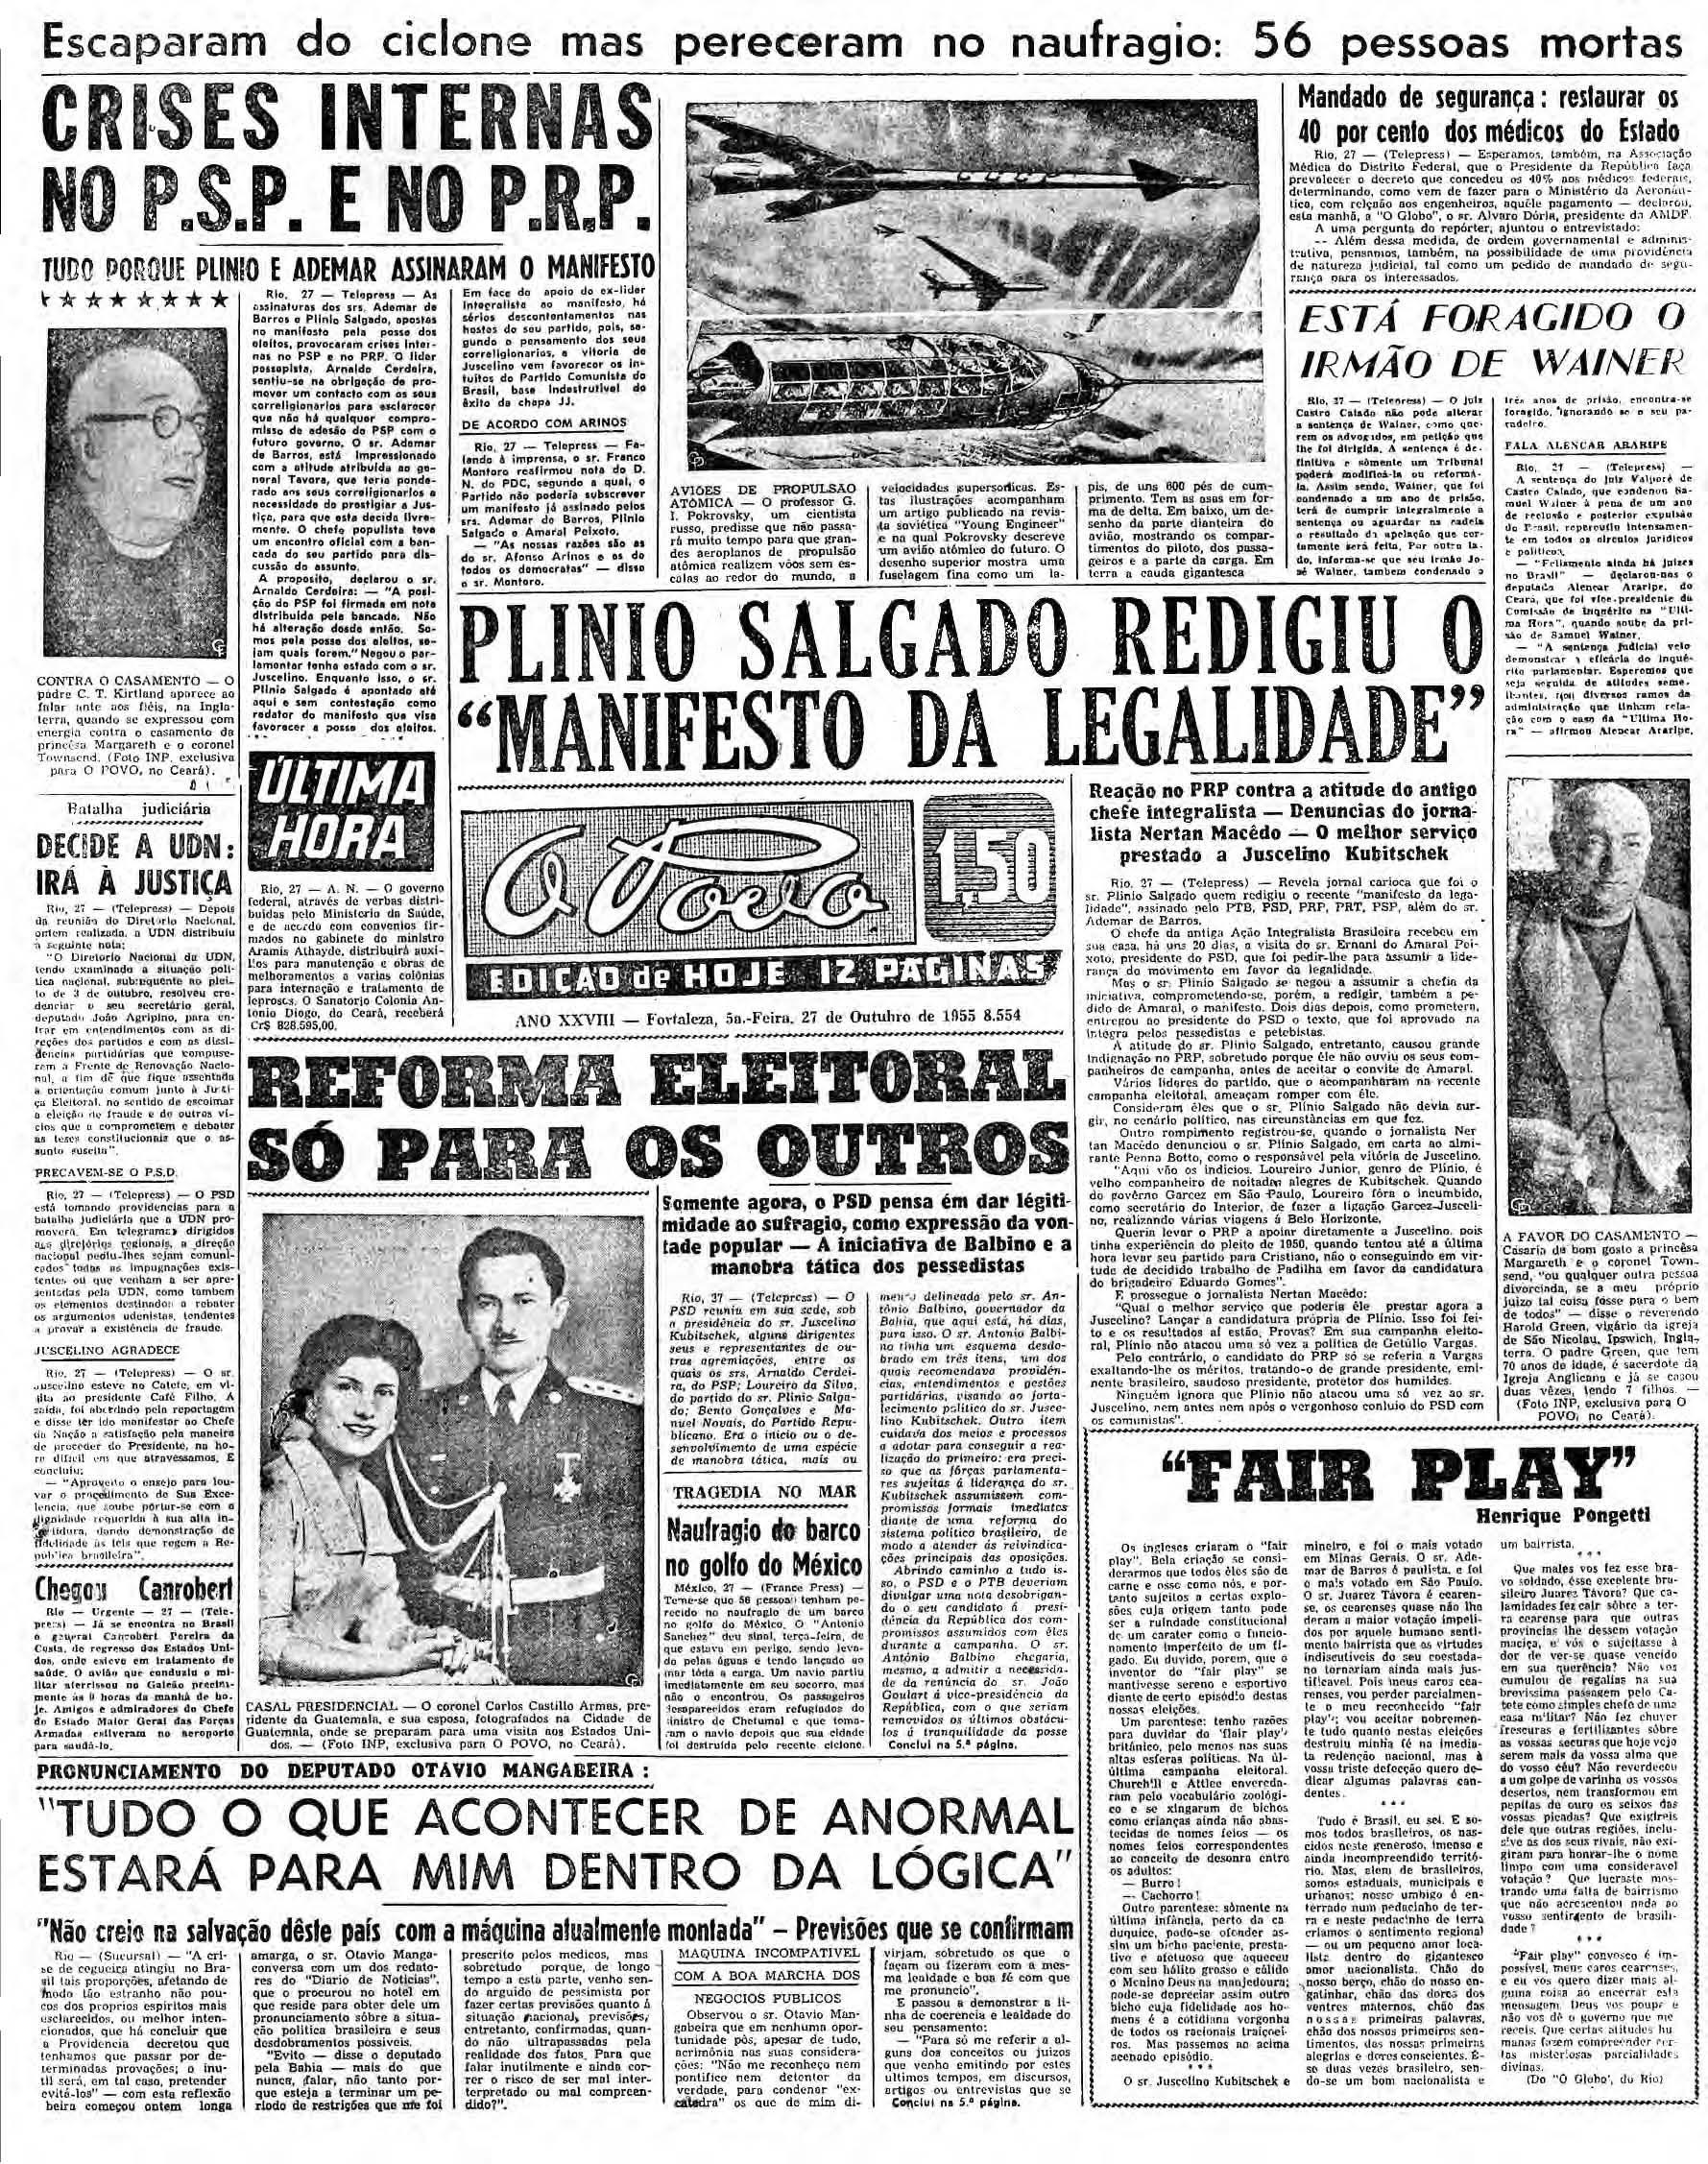 27-10-1955